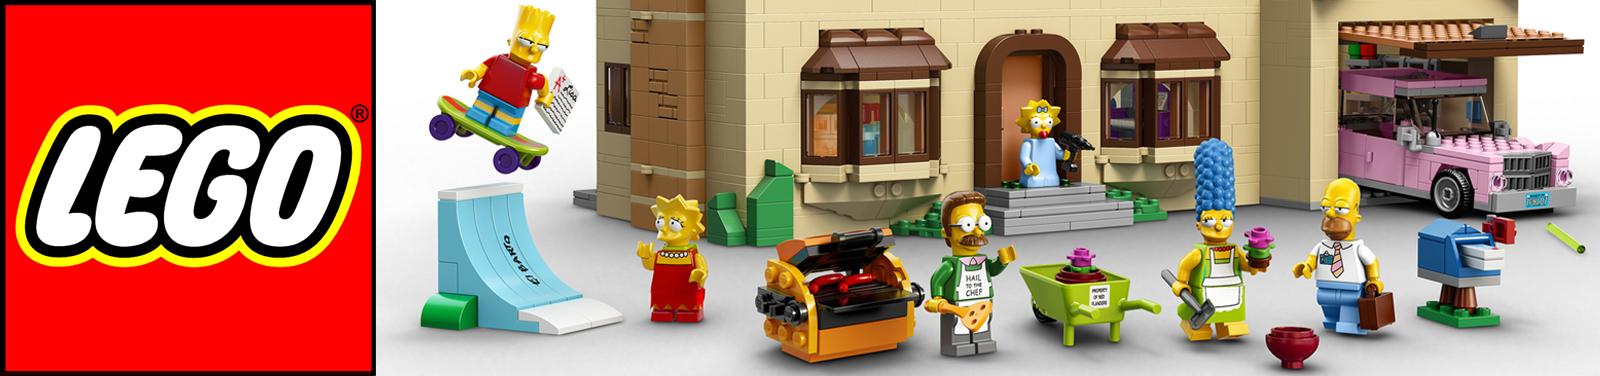 Maison-Lego-Simpsons-baniere